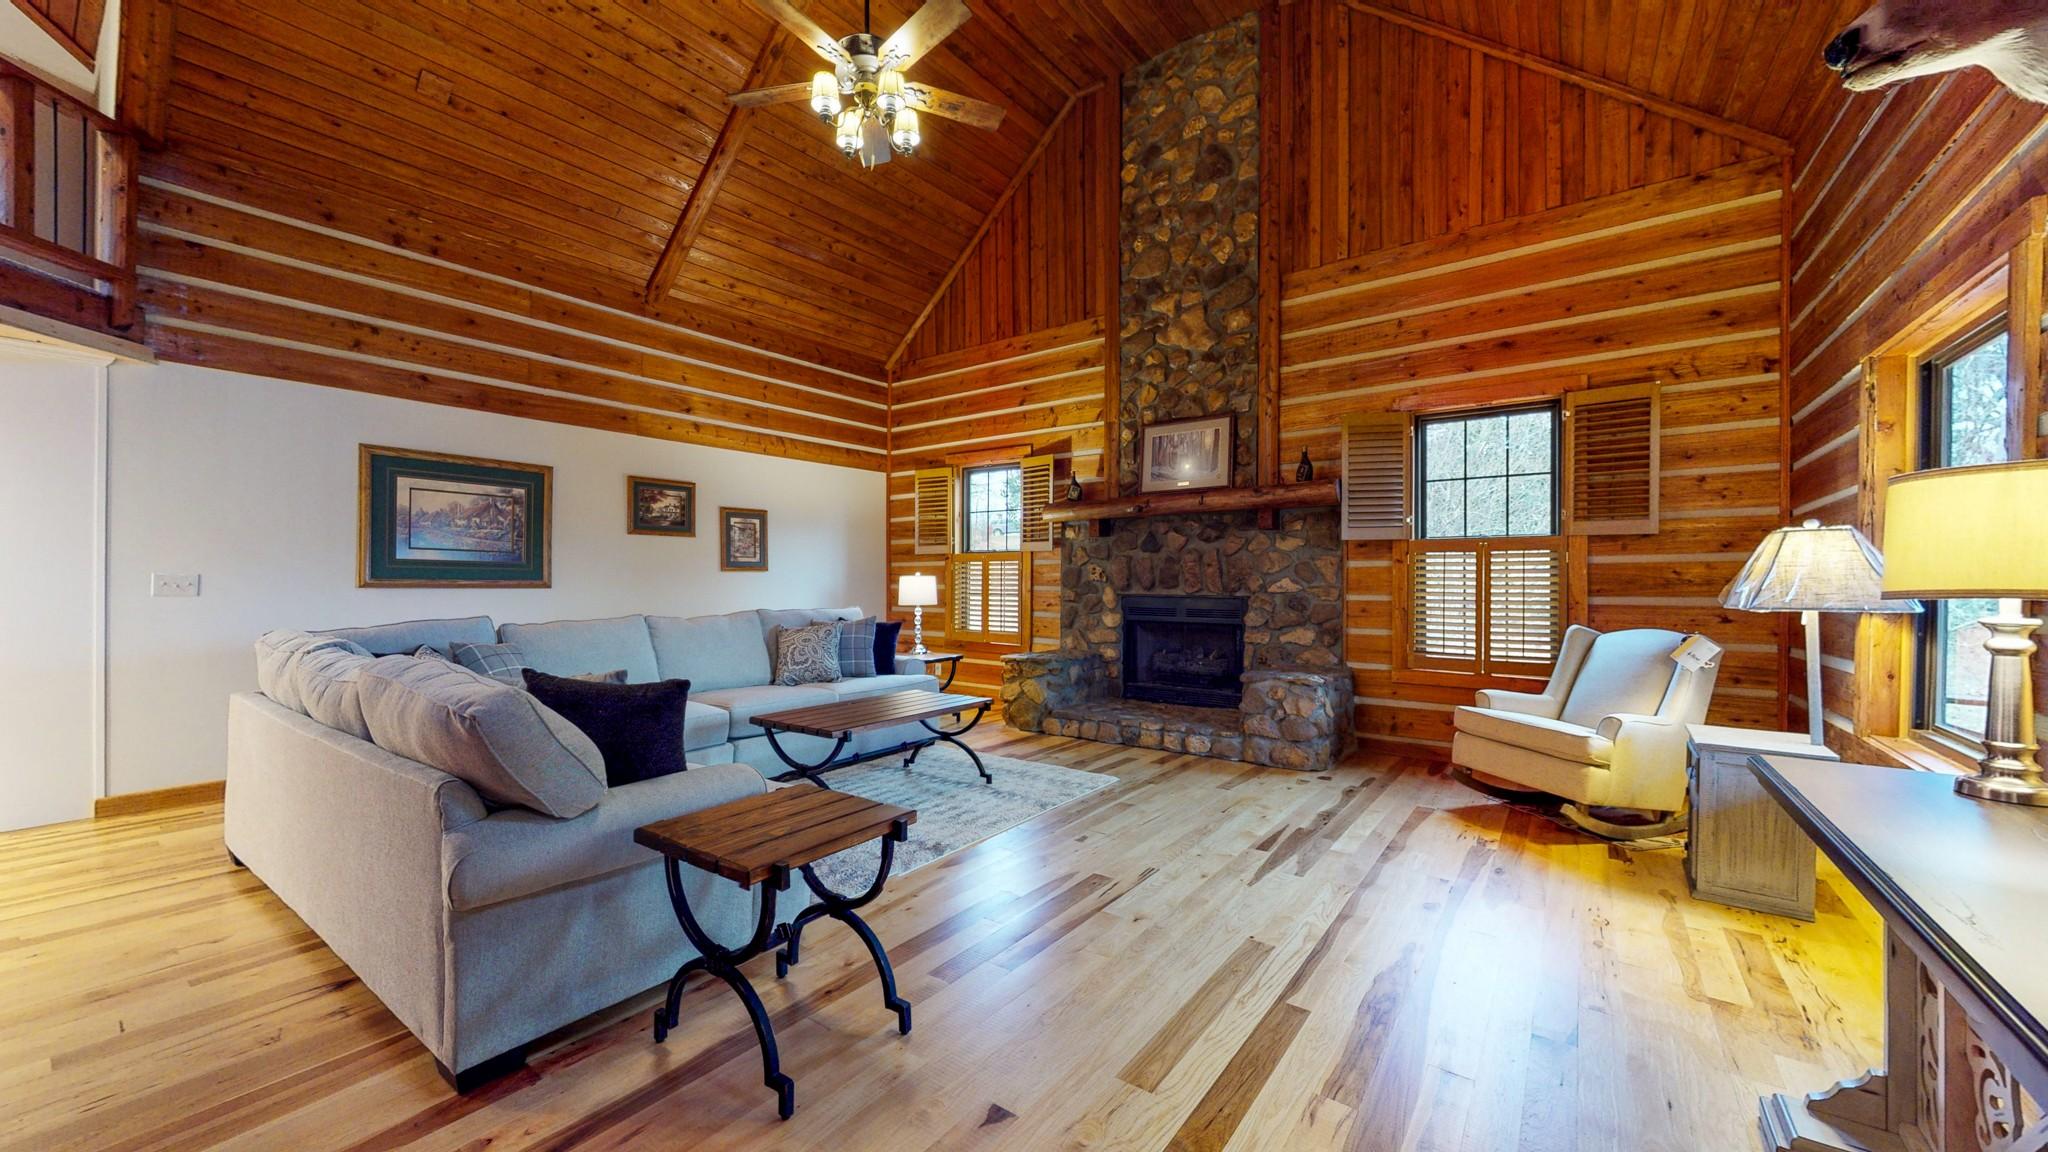 211 Hood St, Dover, TN 37058 - Dover, TN real estate listing